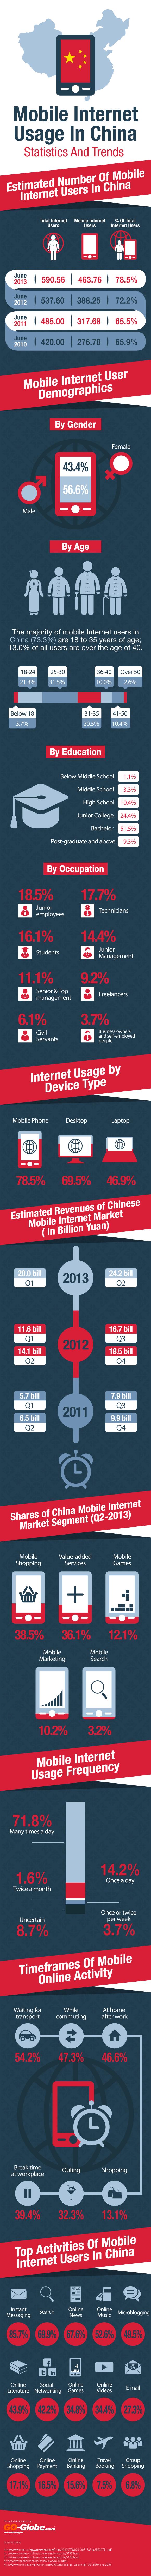 China-Mobile-Internet-Usage